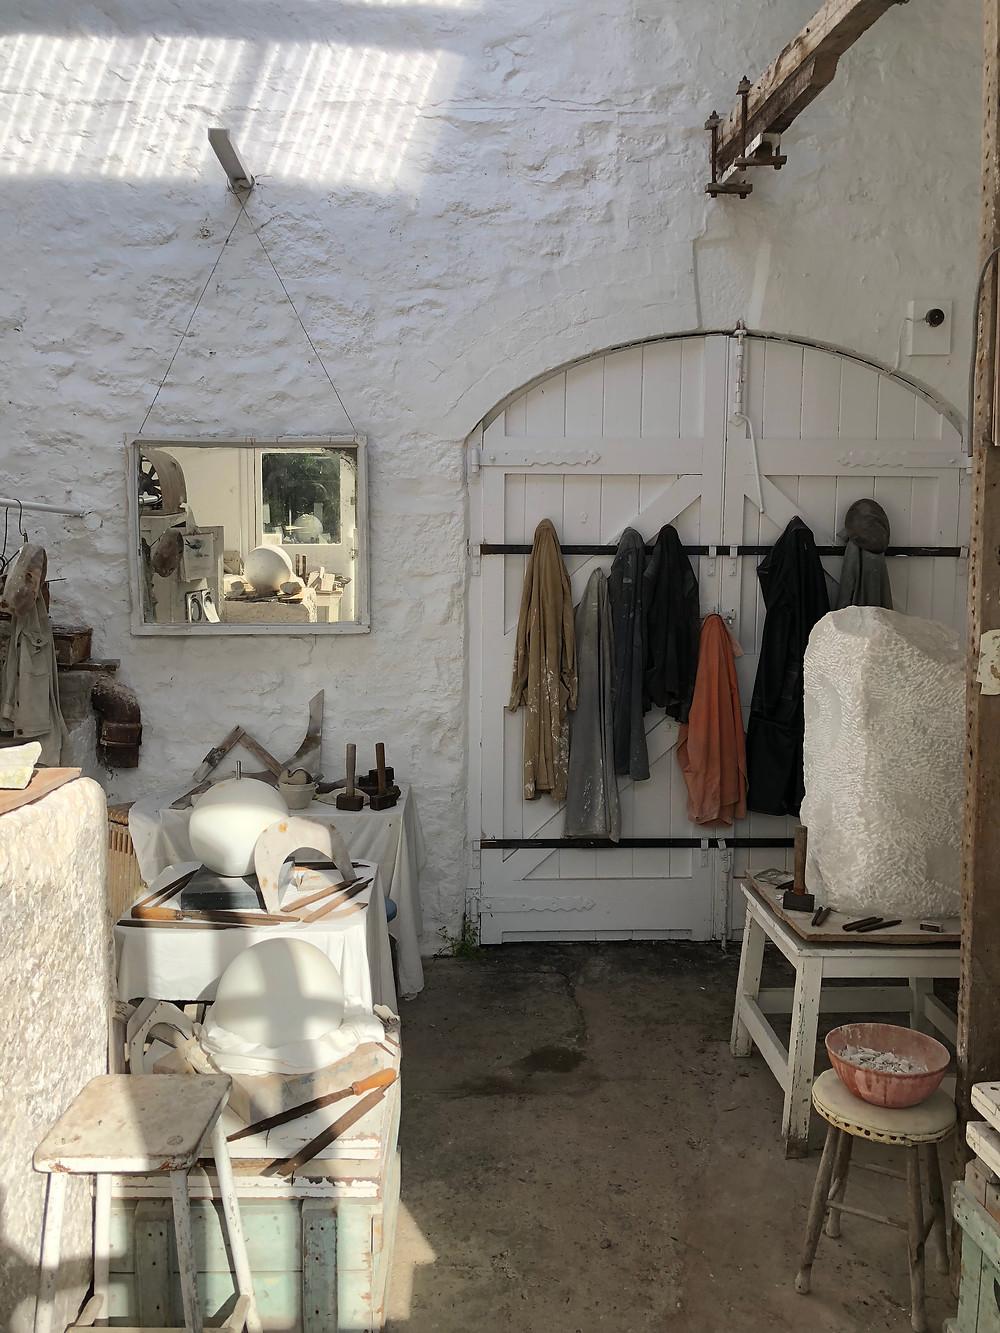 Barbara Hepworth, Barbara Hepworth Museum and Sculpture Garden, Tate St Ives, Tate, British art, artist's studio, sculpture